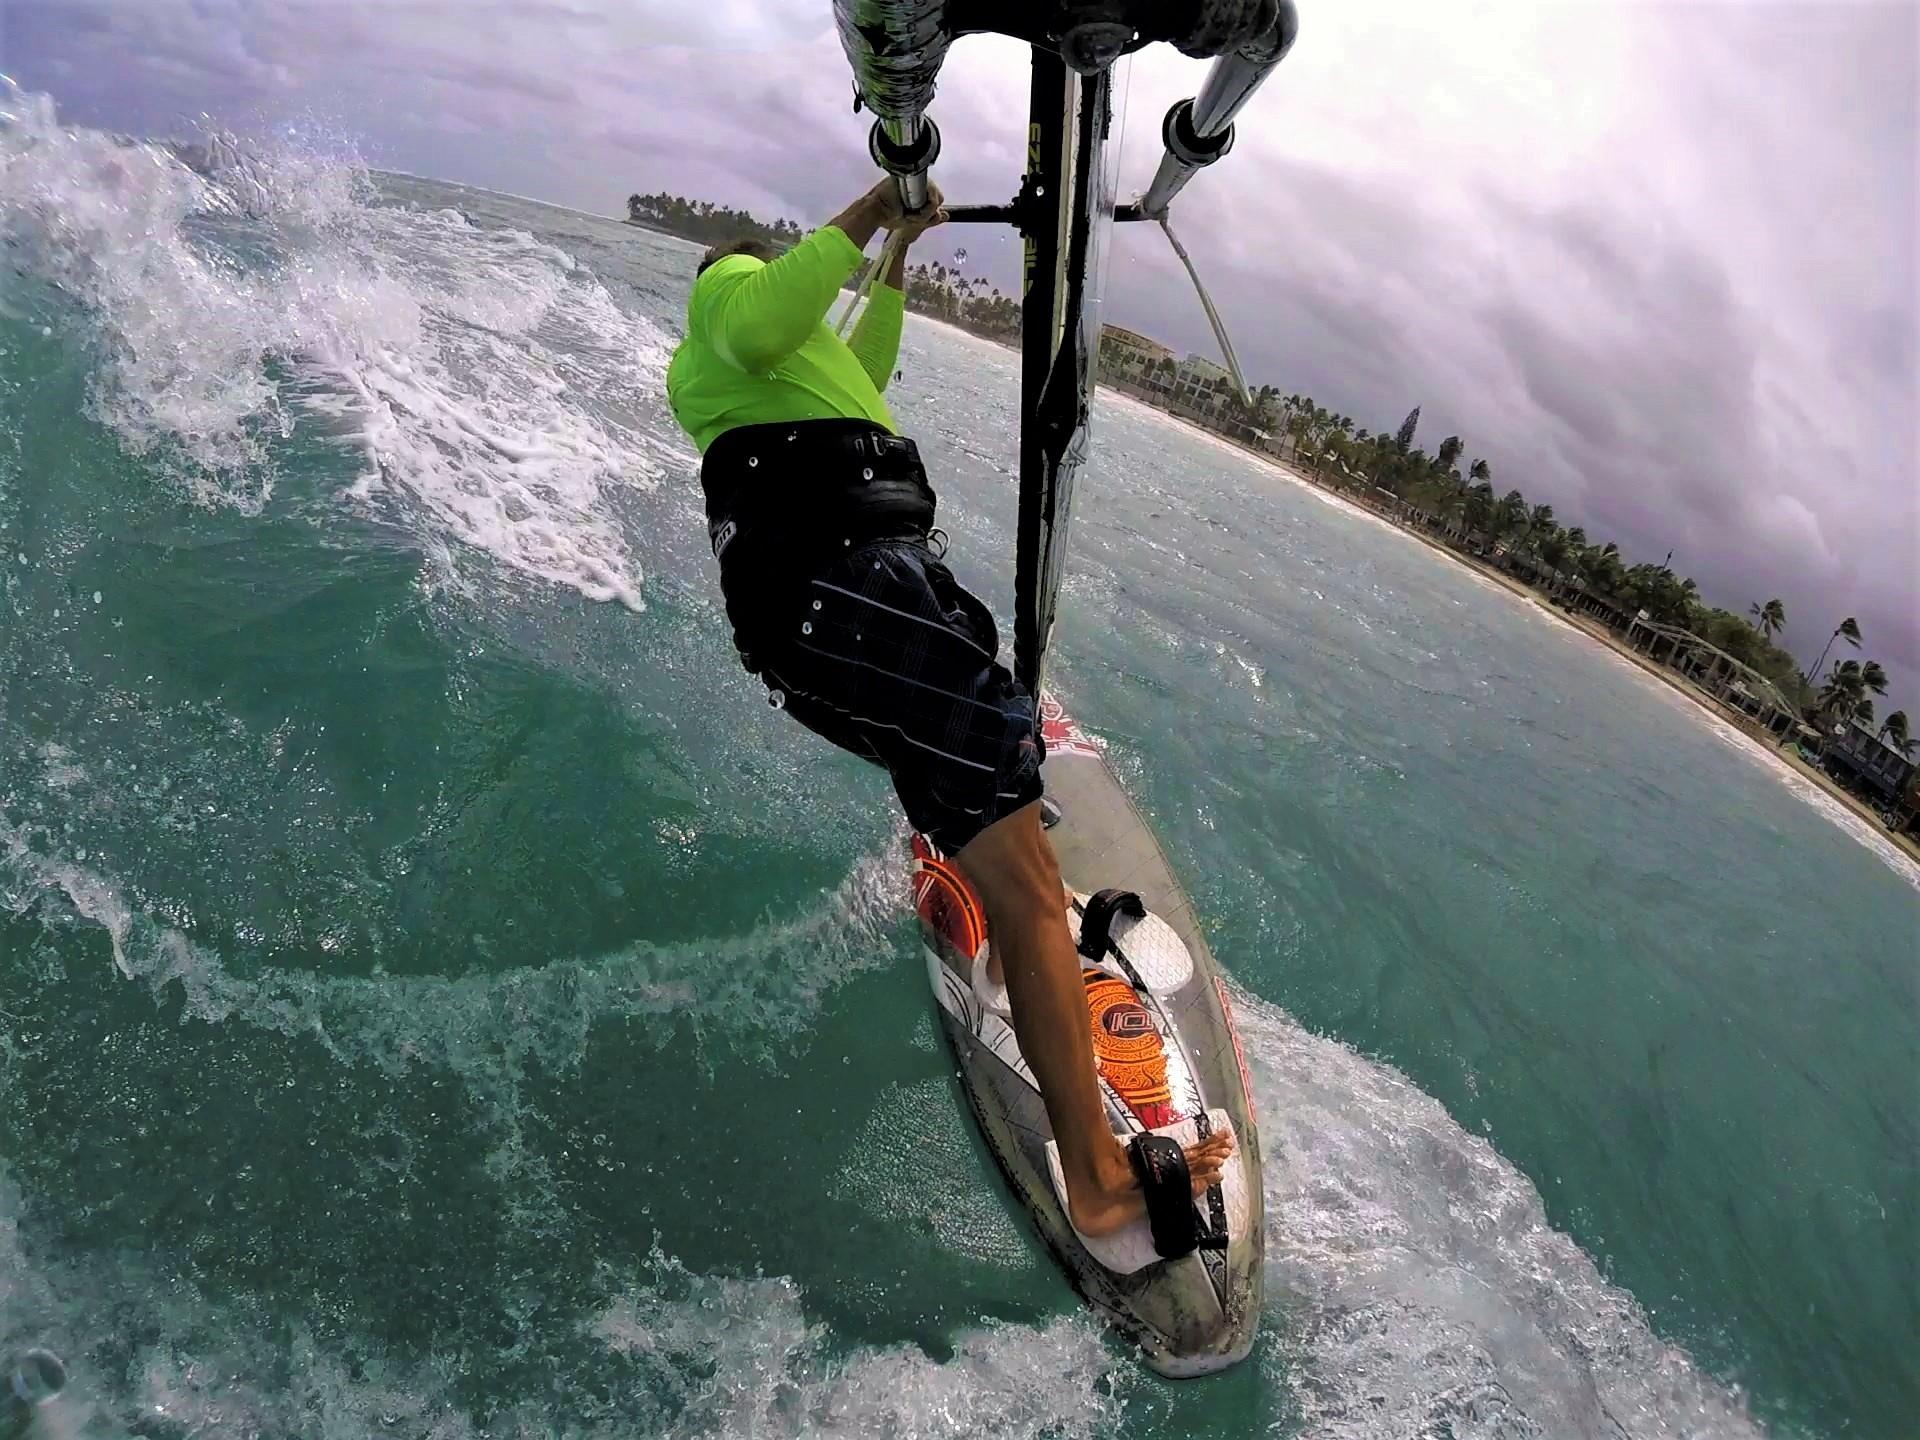 Manu's Windsurfing Blog - Board TESTS!